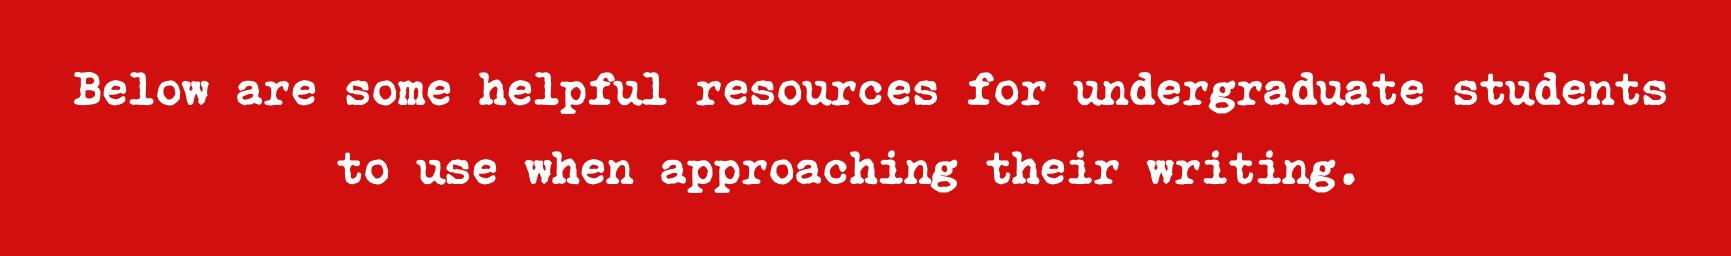 Undergrad Resources.png